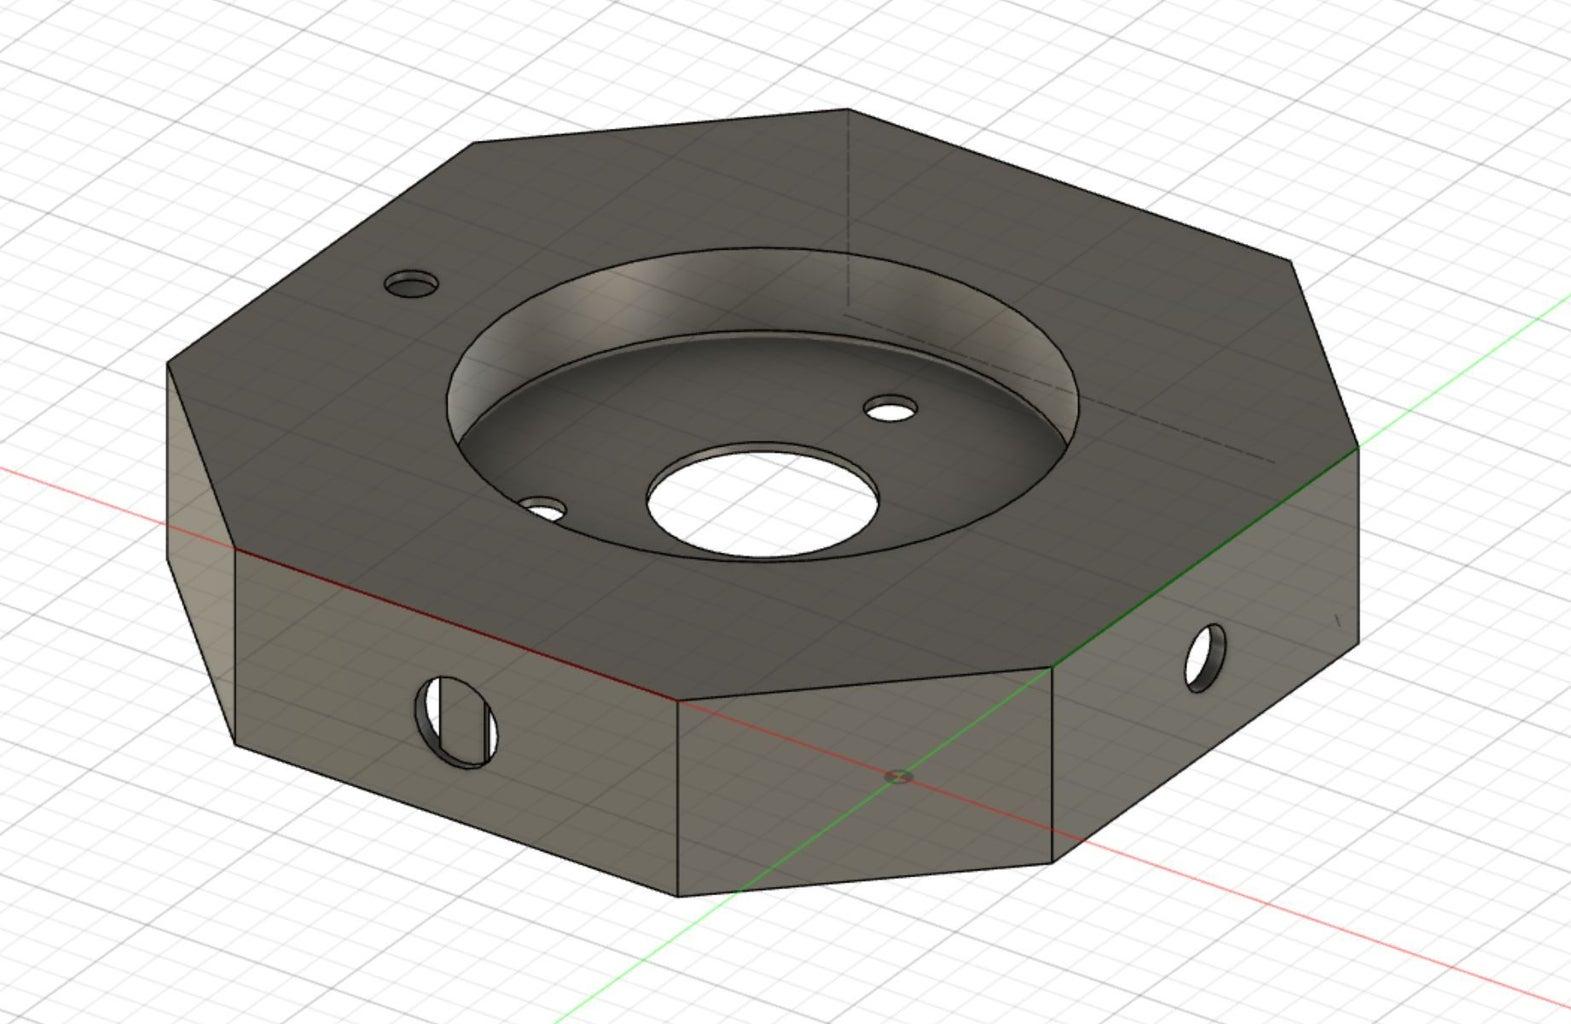 3D Printed Base